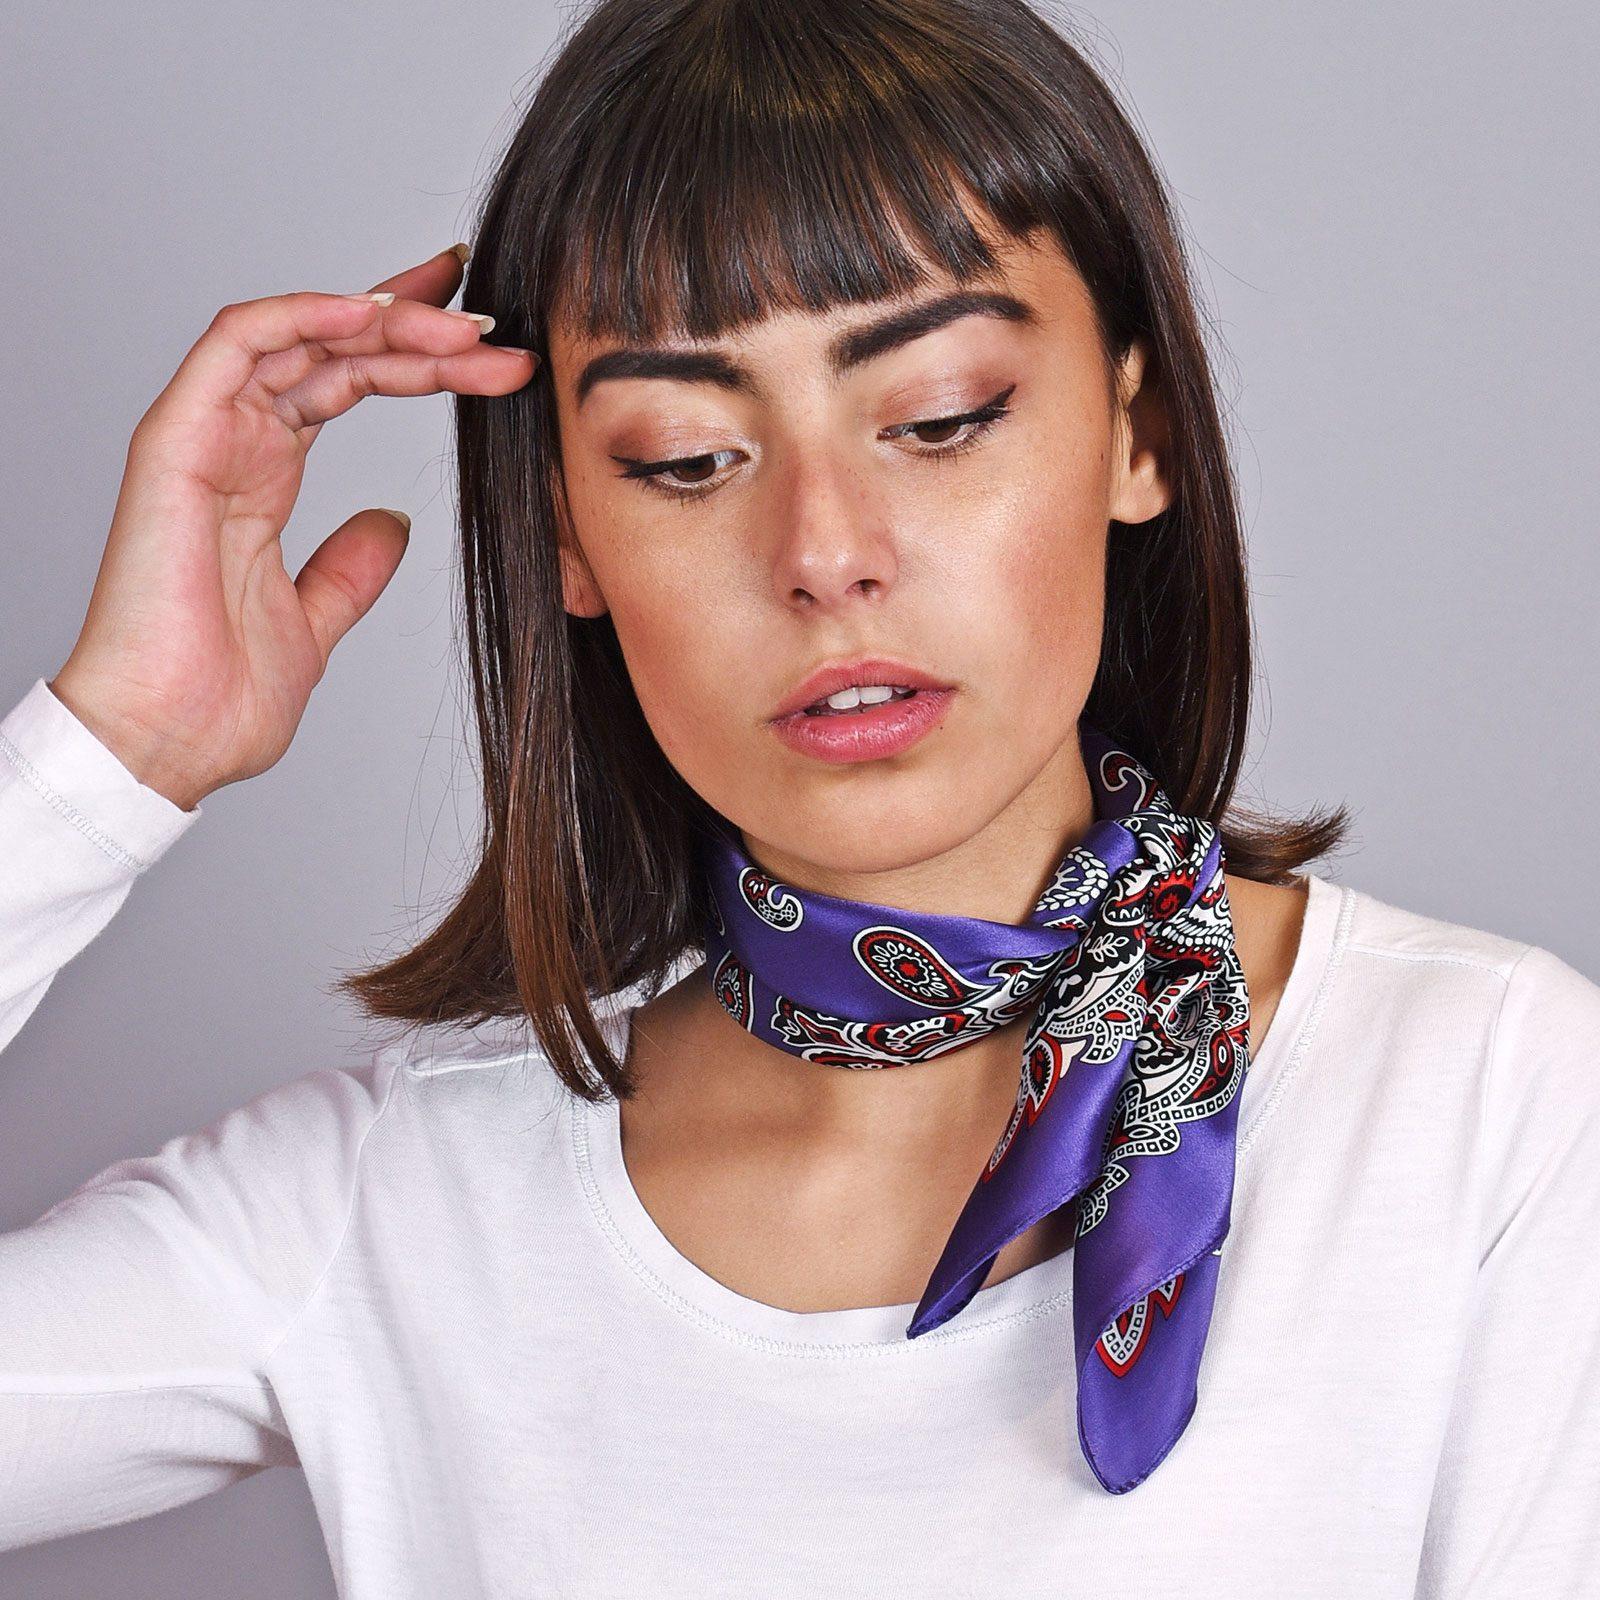 http://lookbook.allee-du-foulard.fr/wp-content/uploads/2018/11/AT-04612-VF16-carre-de-soie-violet-indigo-cachemire-1600x1600.jpg